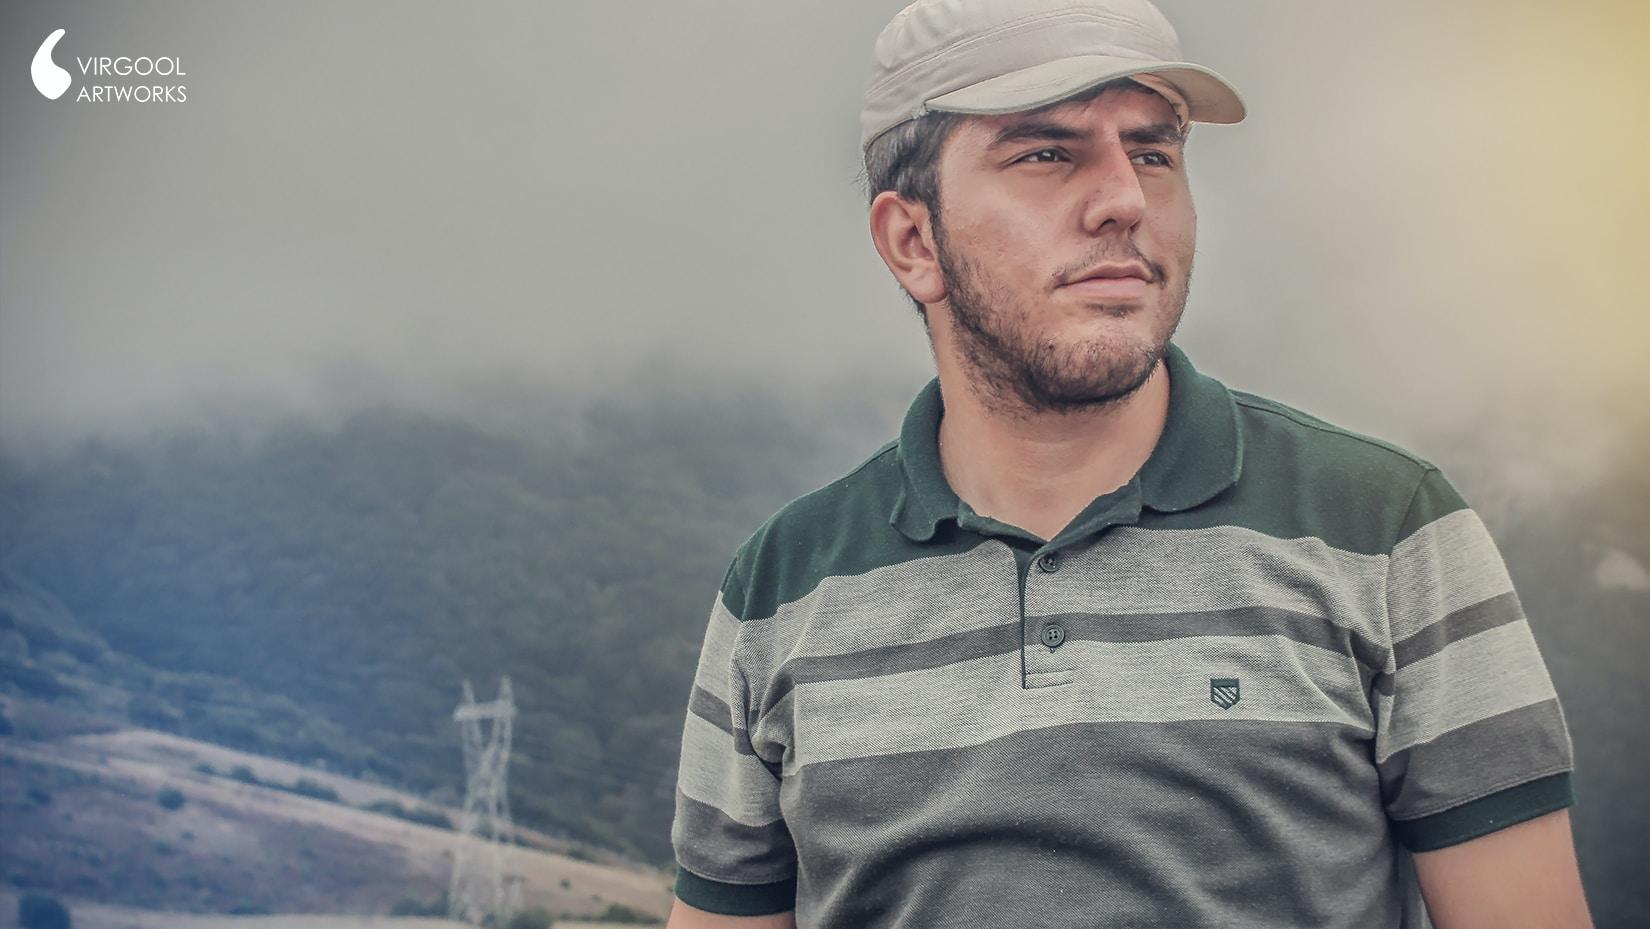 Go to mehdi maleki's profile